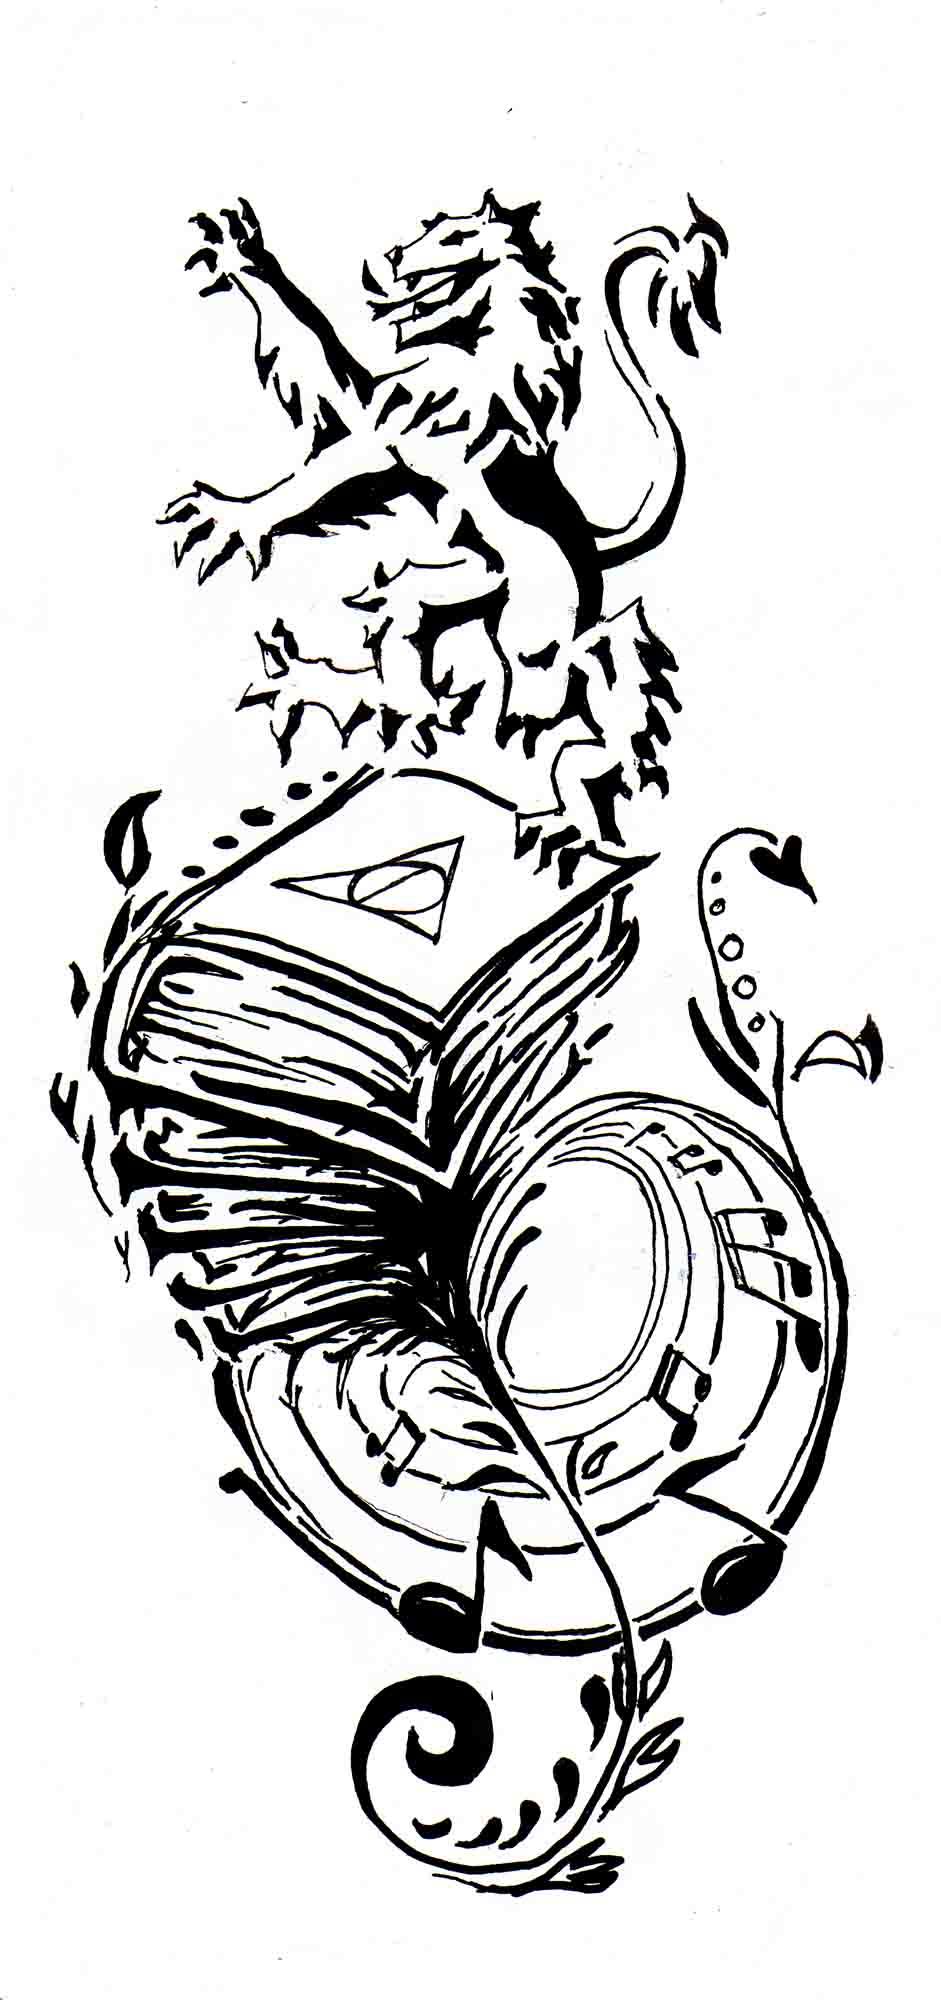 Untitled tattoo design